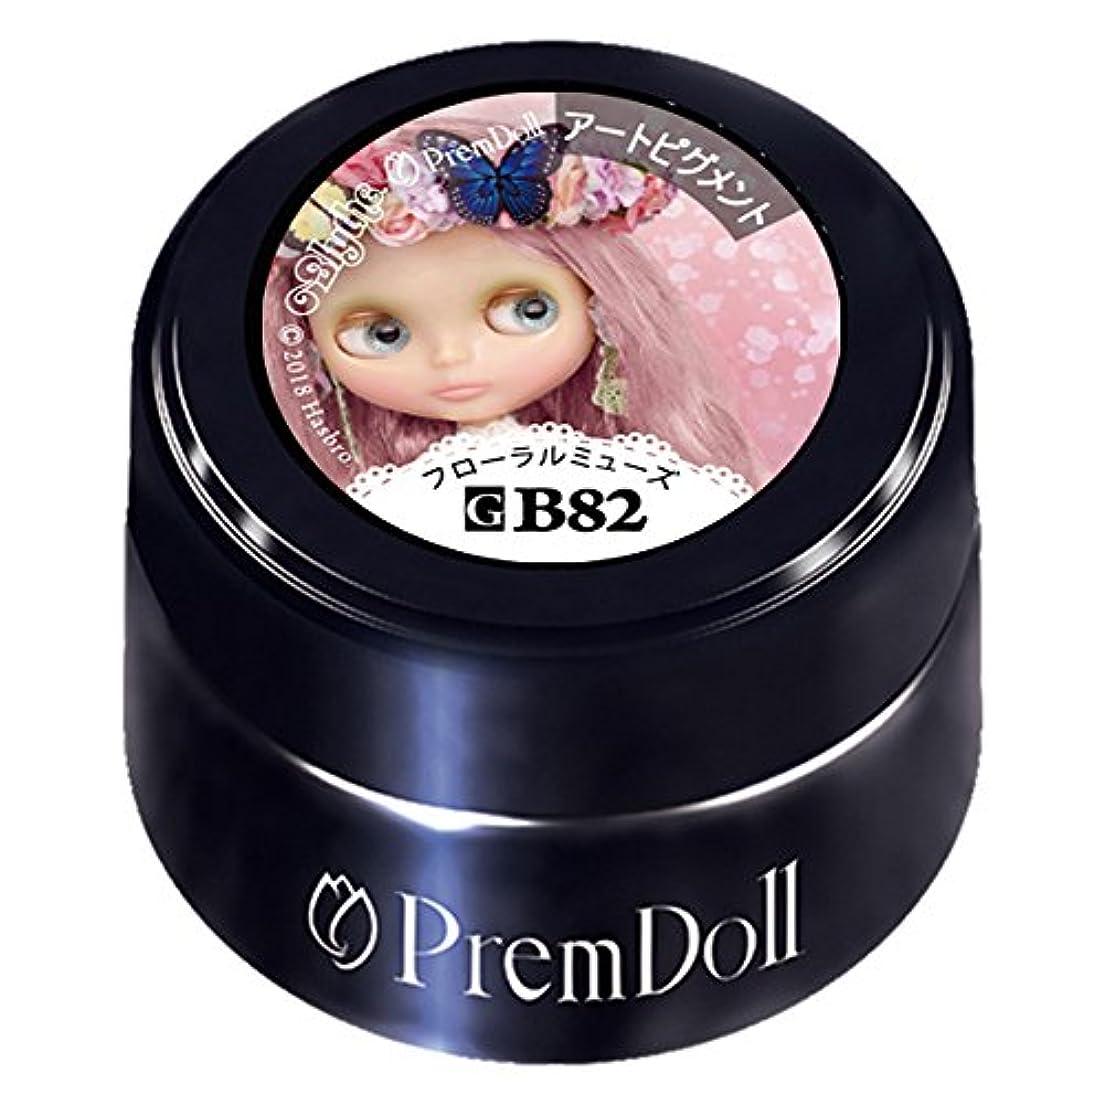 PRE GEL プリムドール フローラルミューズ82 DOLL-B82 3g UV/LED対応